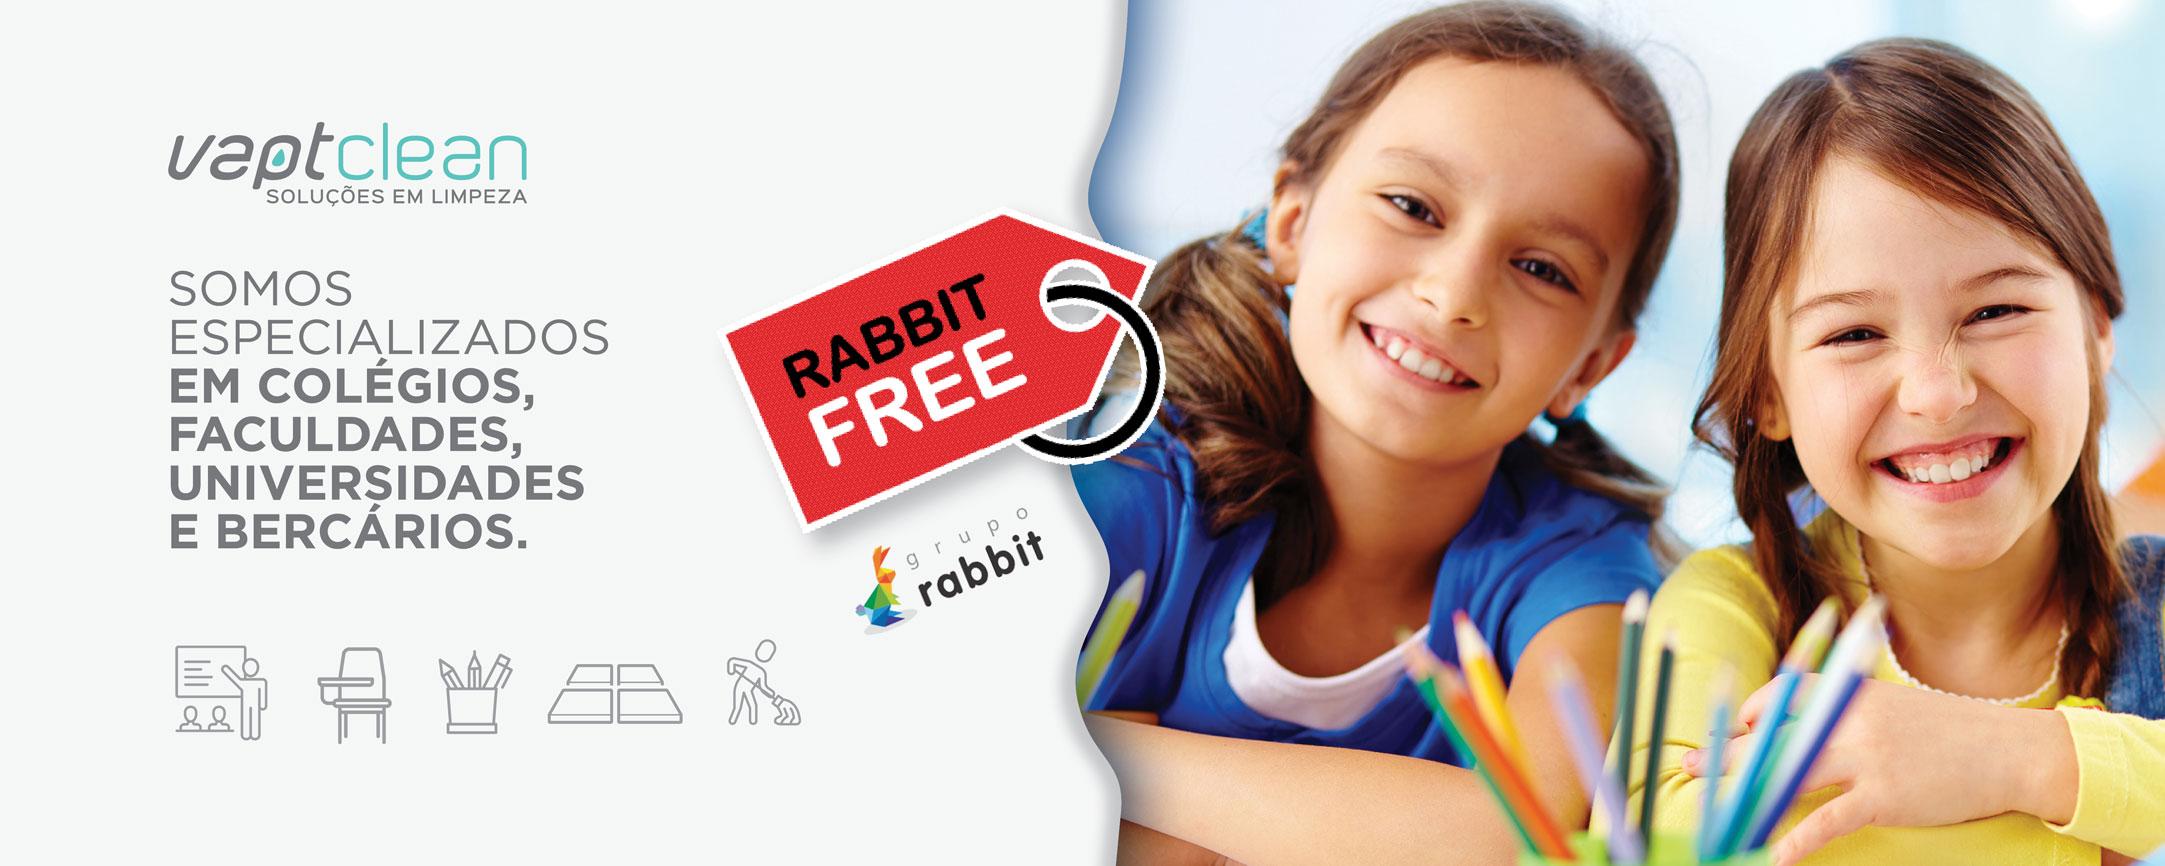 Banner-site-Rabbit-Free